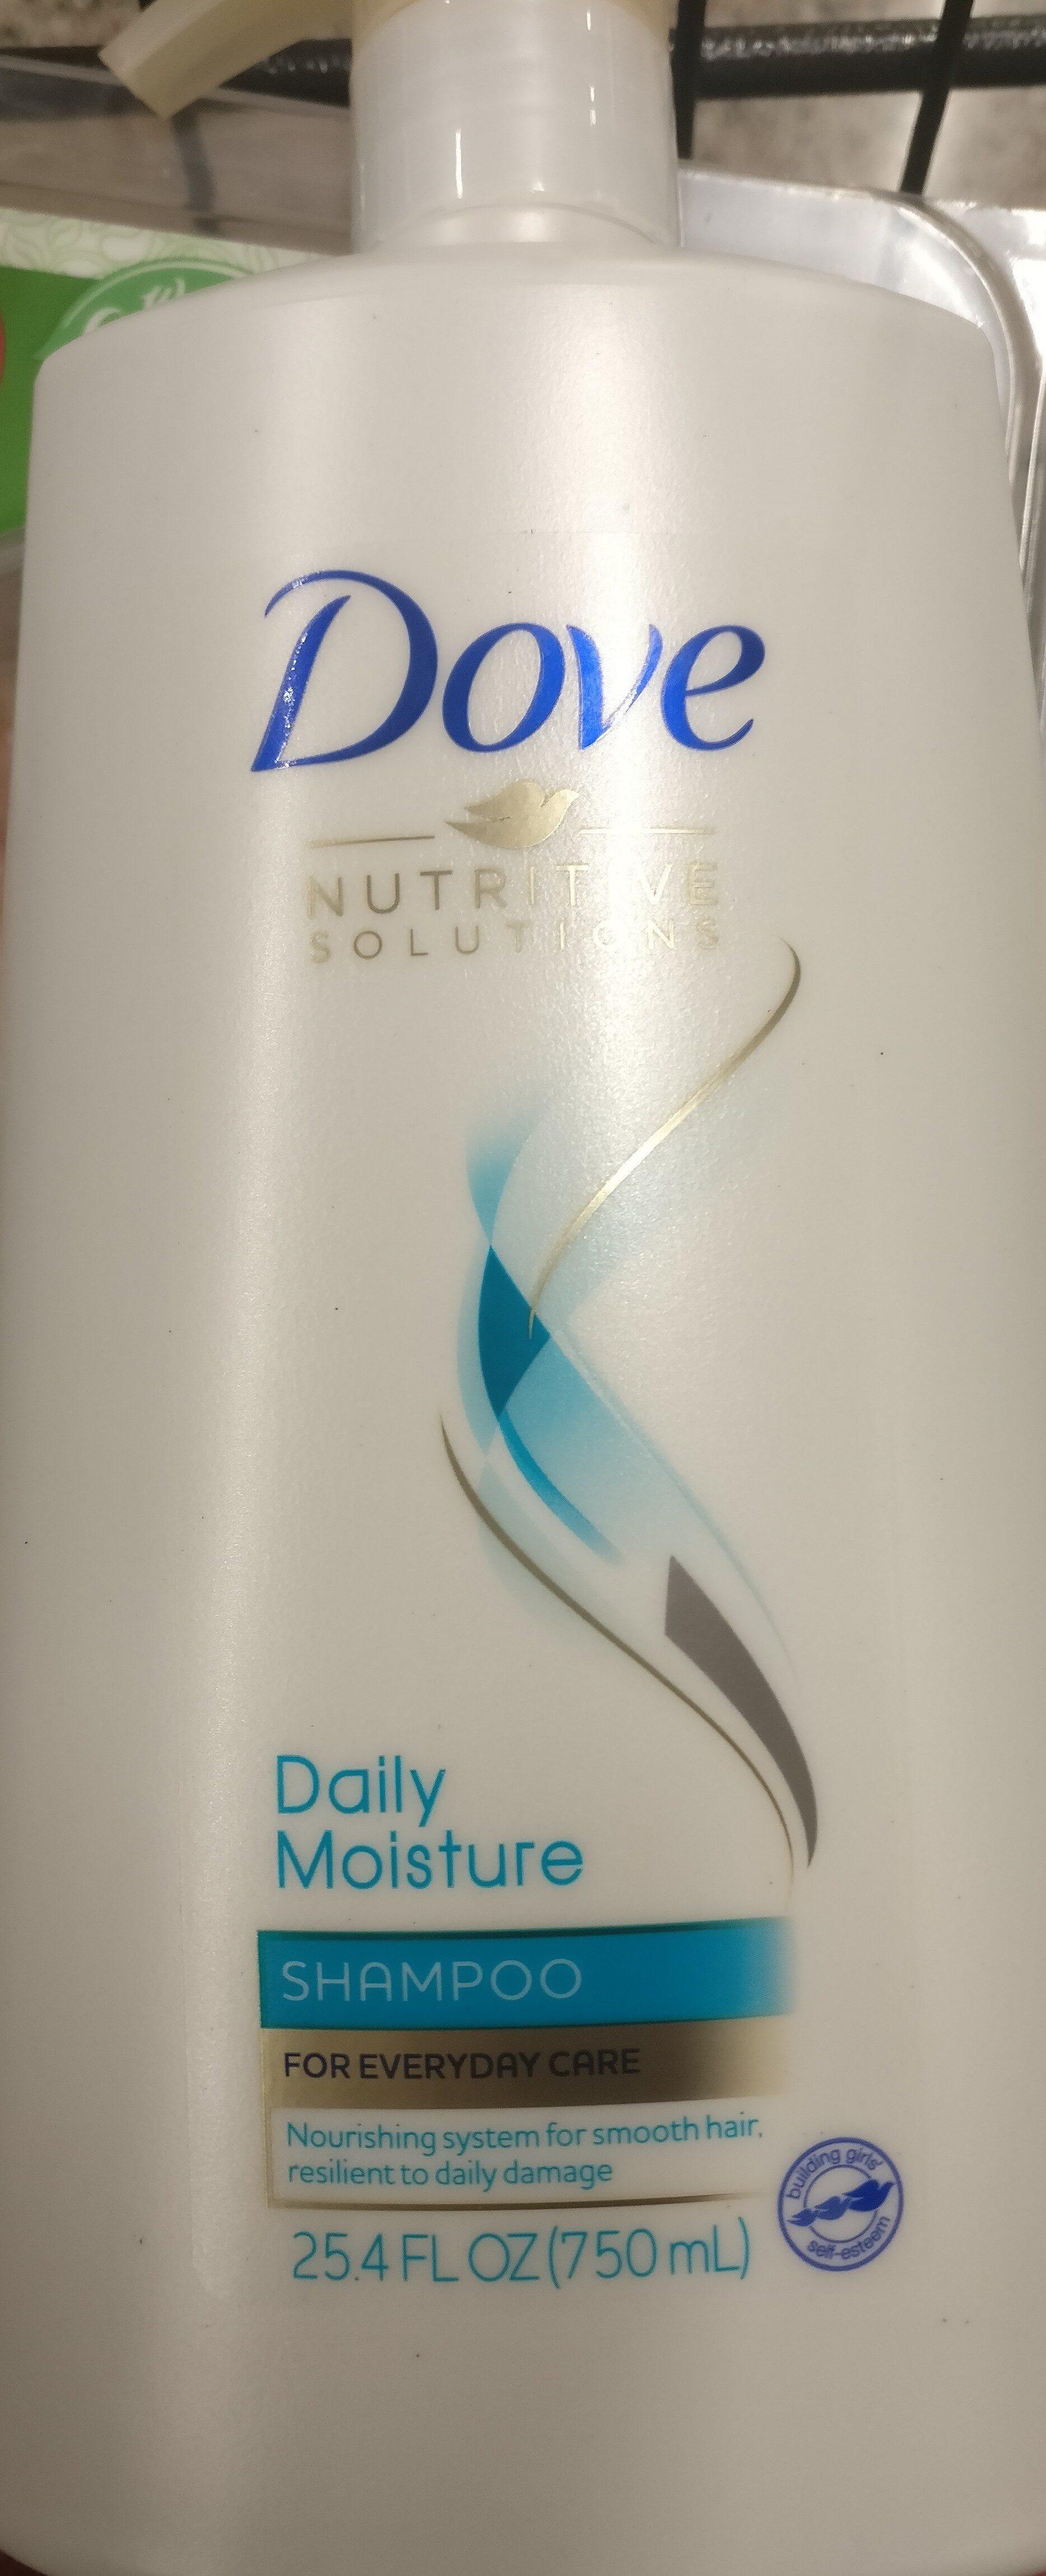 dove daily moisture shampoo - Product - en